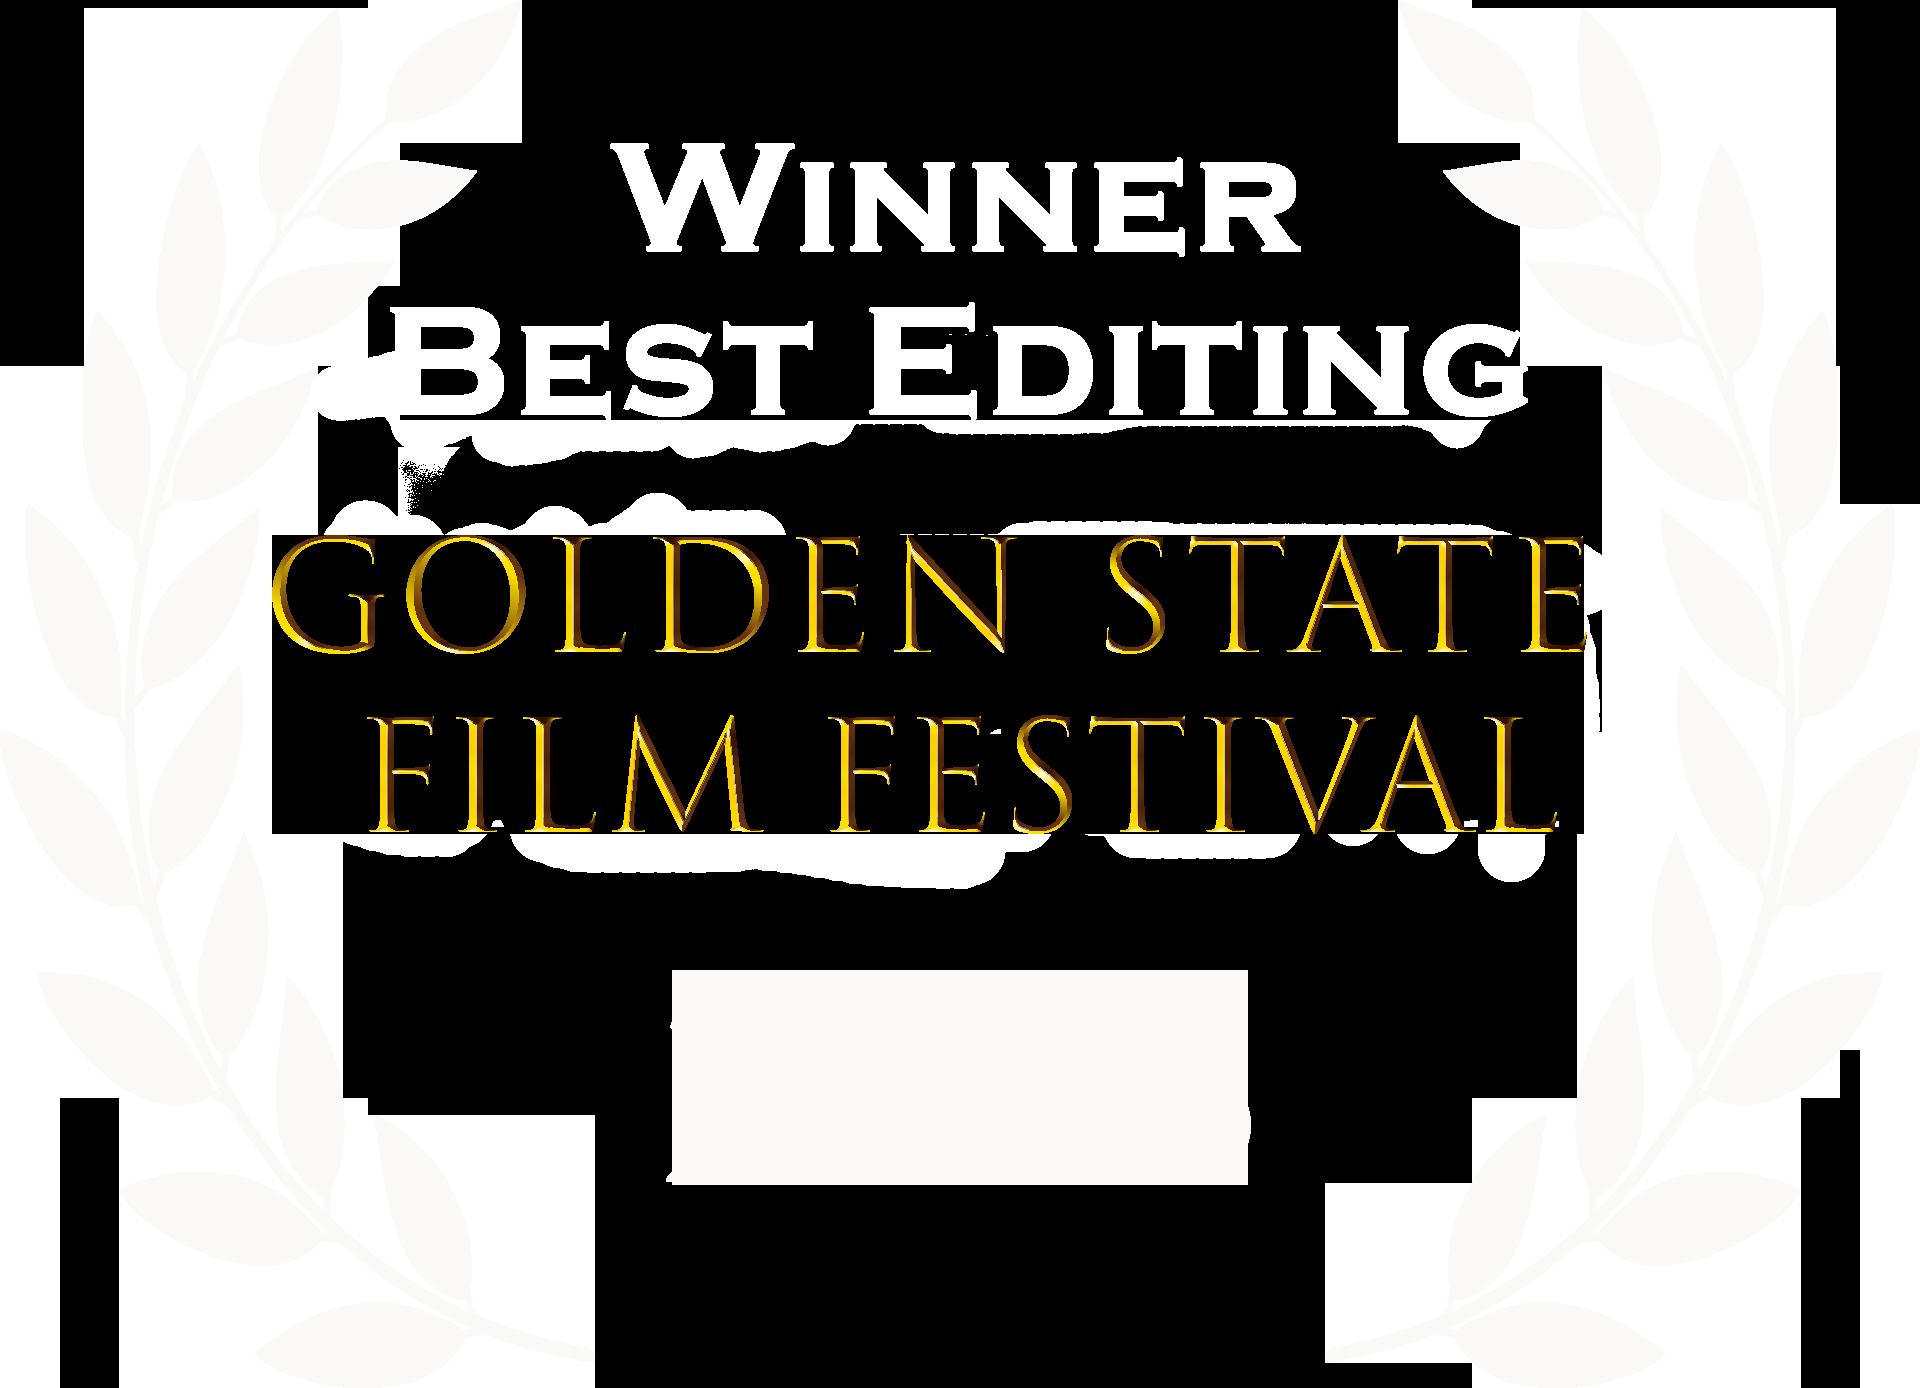 golden state ff 2018 winner best editing.png